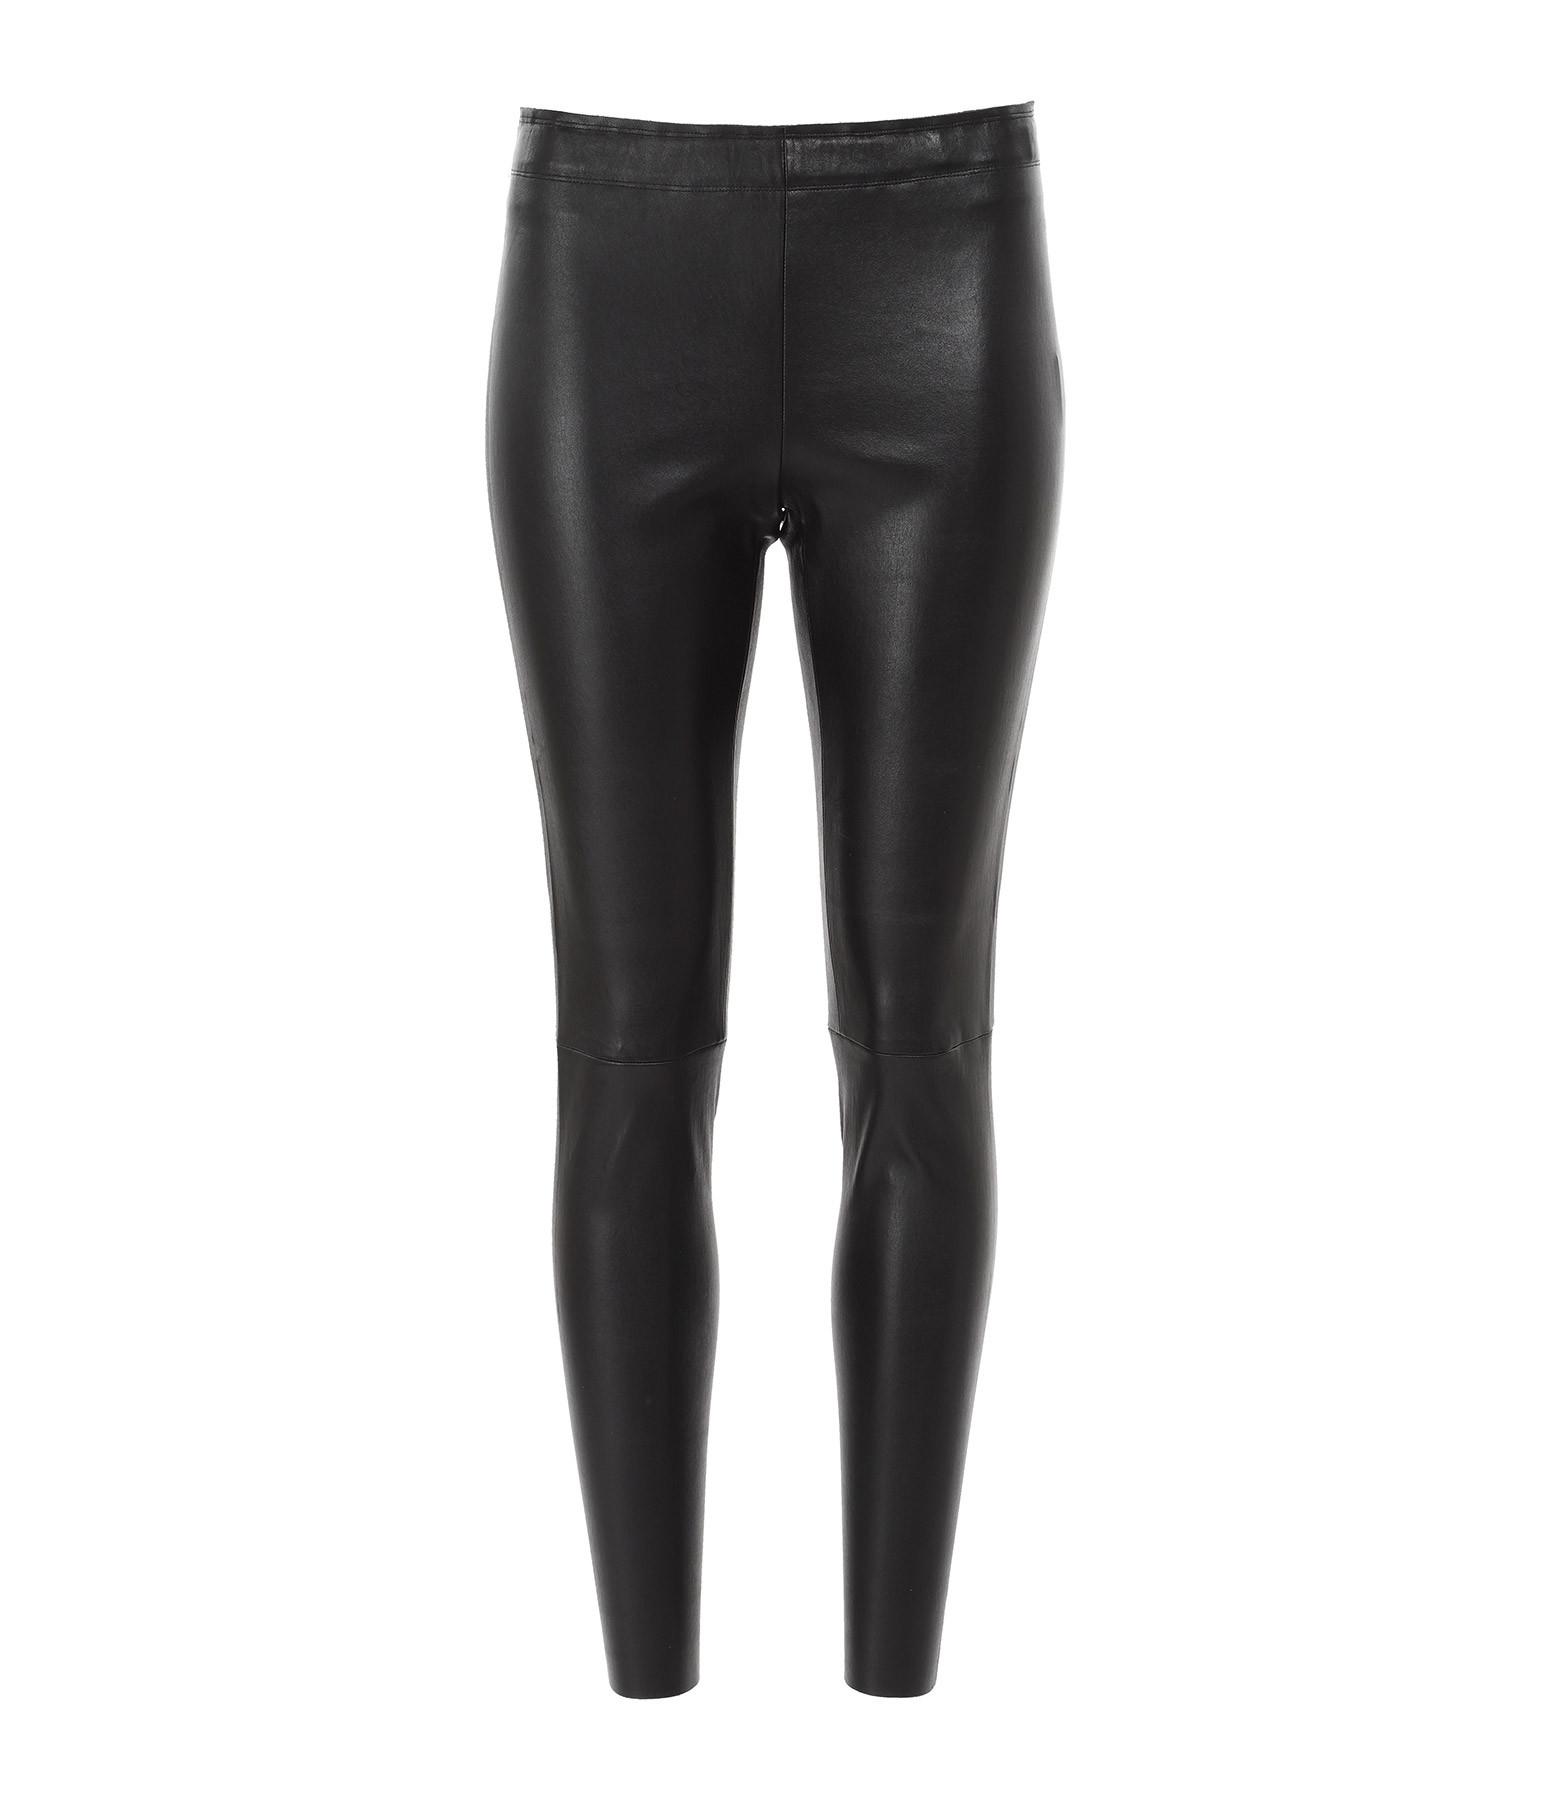 STOULS - Pantalon Carlson Agneau Plongé Regular Noir